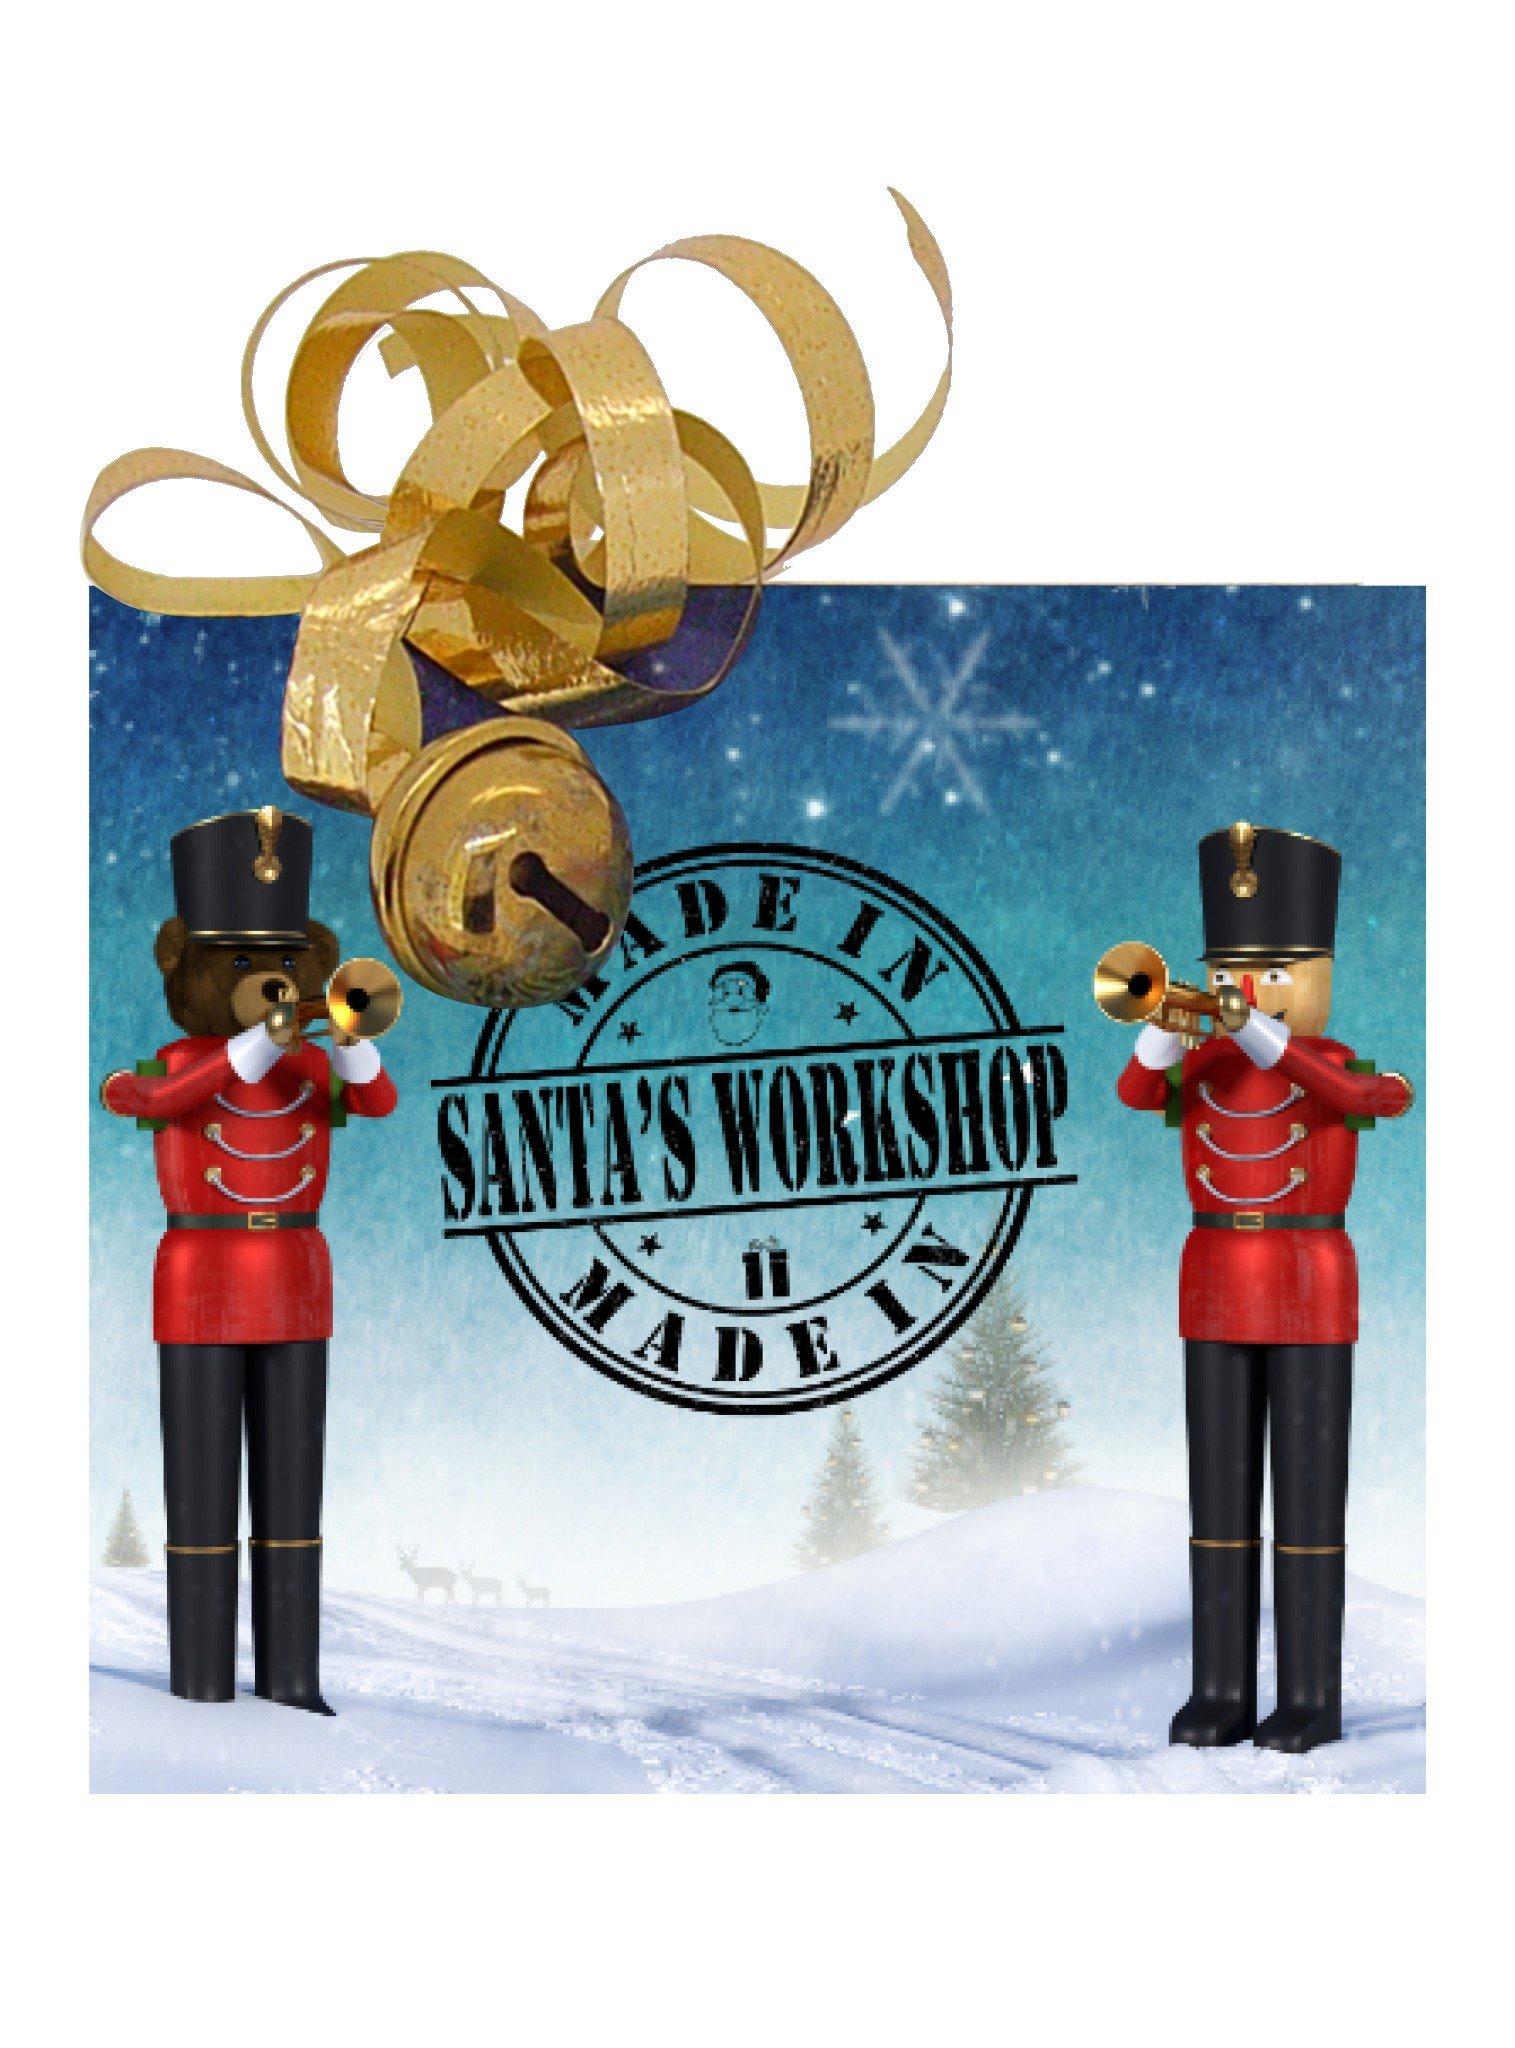 Free Gift Tag Made in Santas Workshop